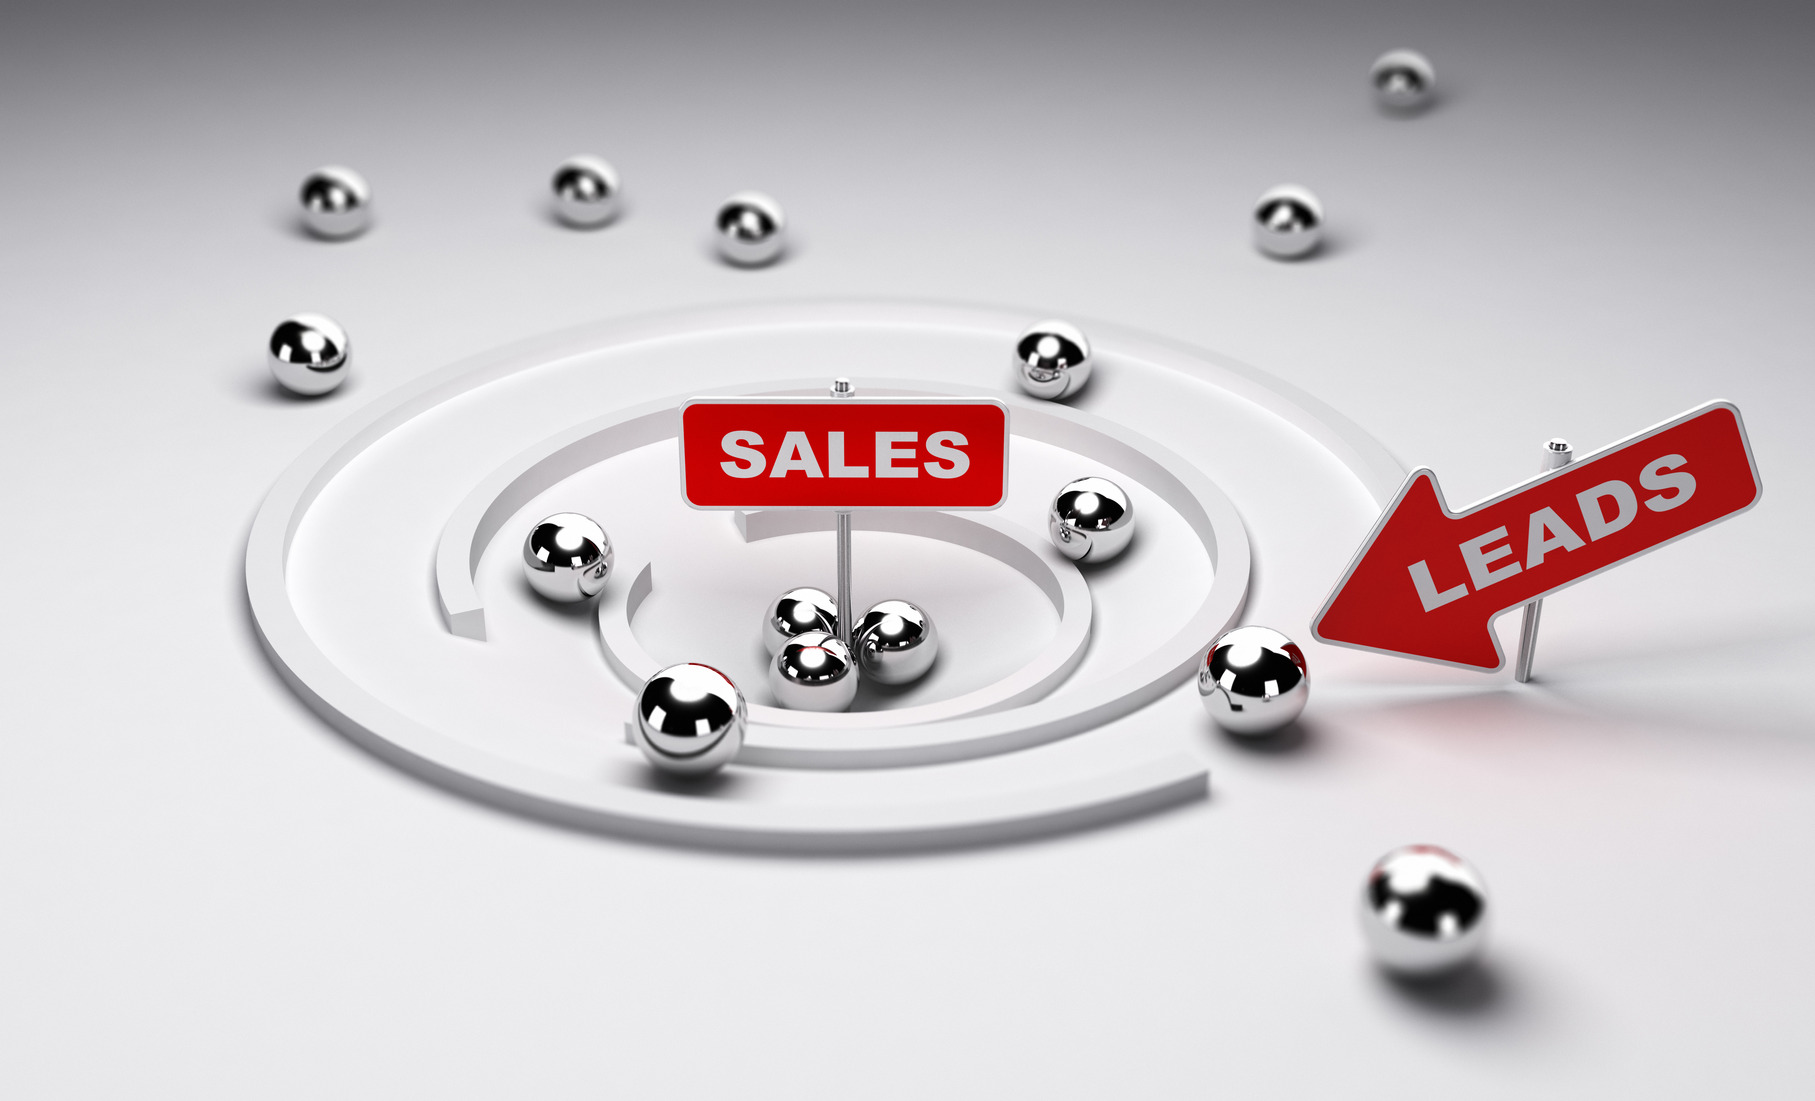 Pan Atlantic - Sales leads